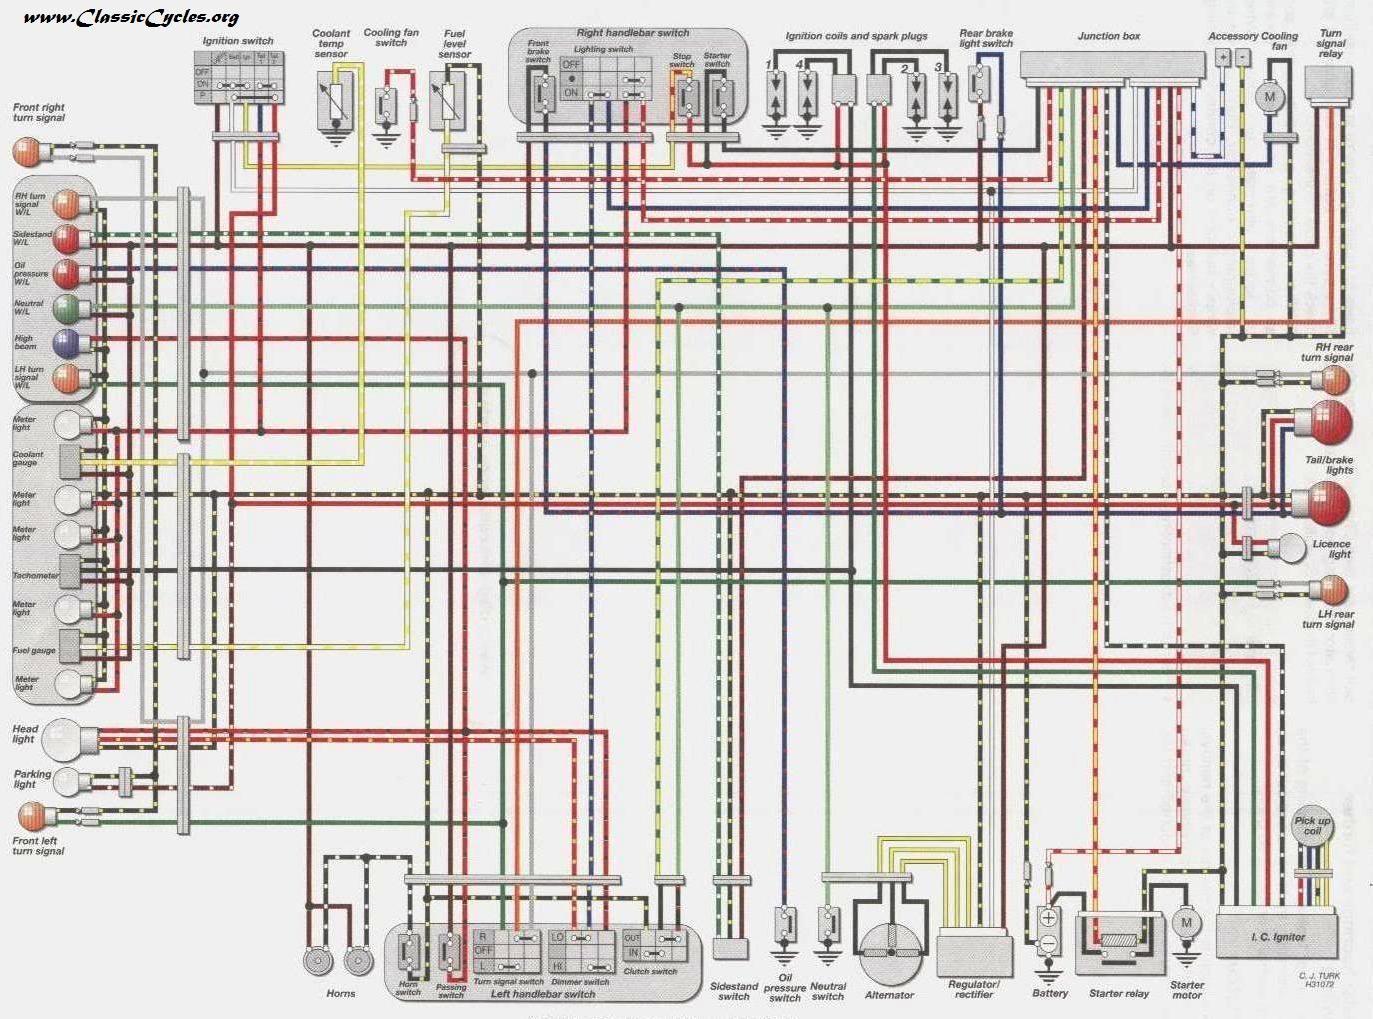 2001 nissan frontier alternator wiring diagram glowshift gauges kawasaki motorcycle diagrams